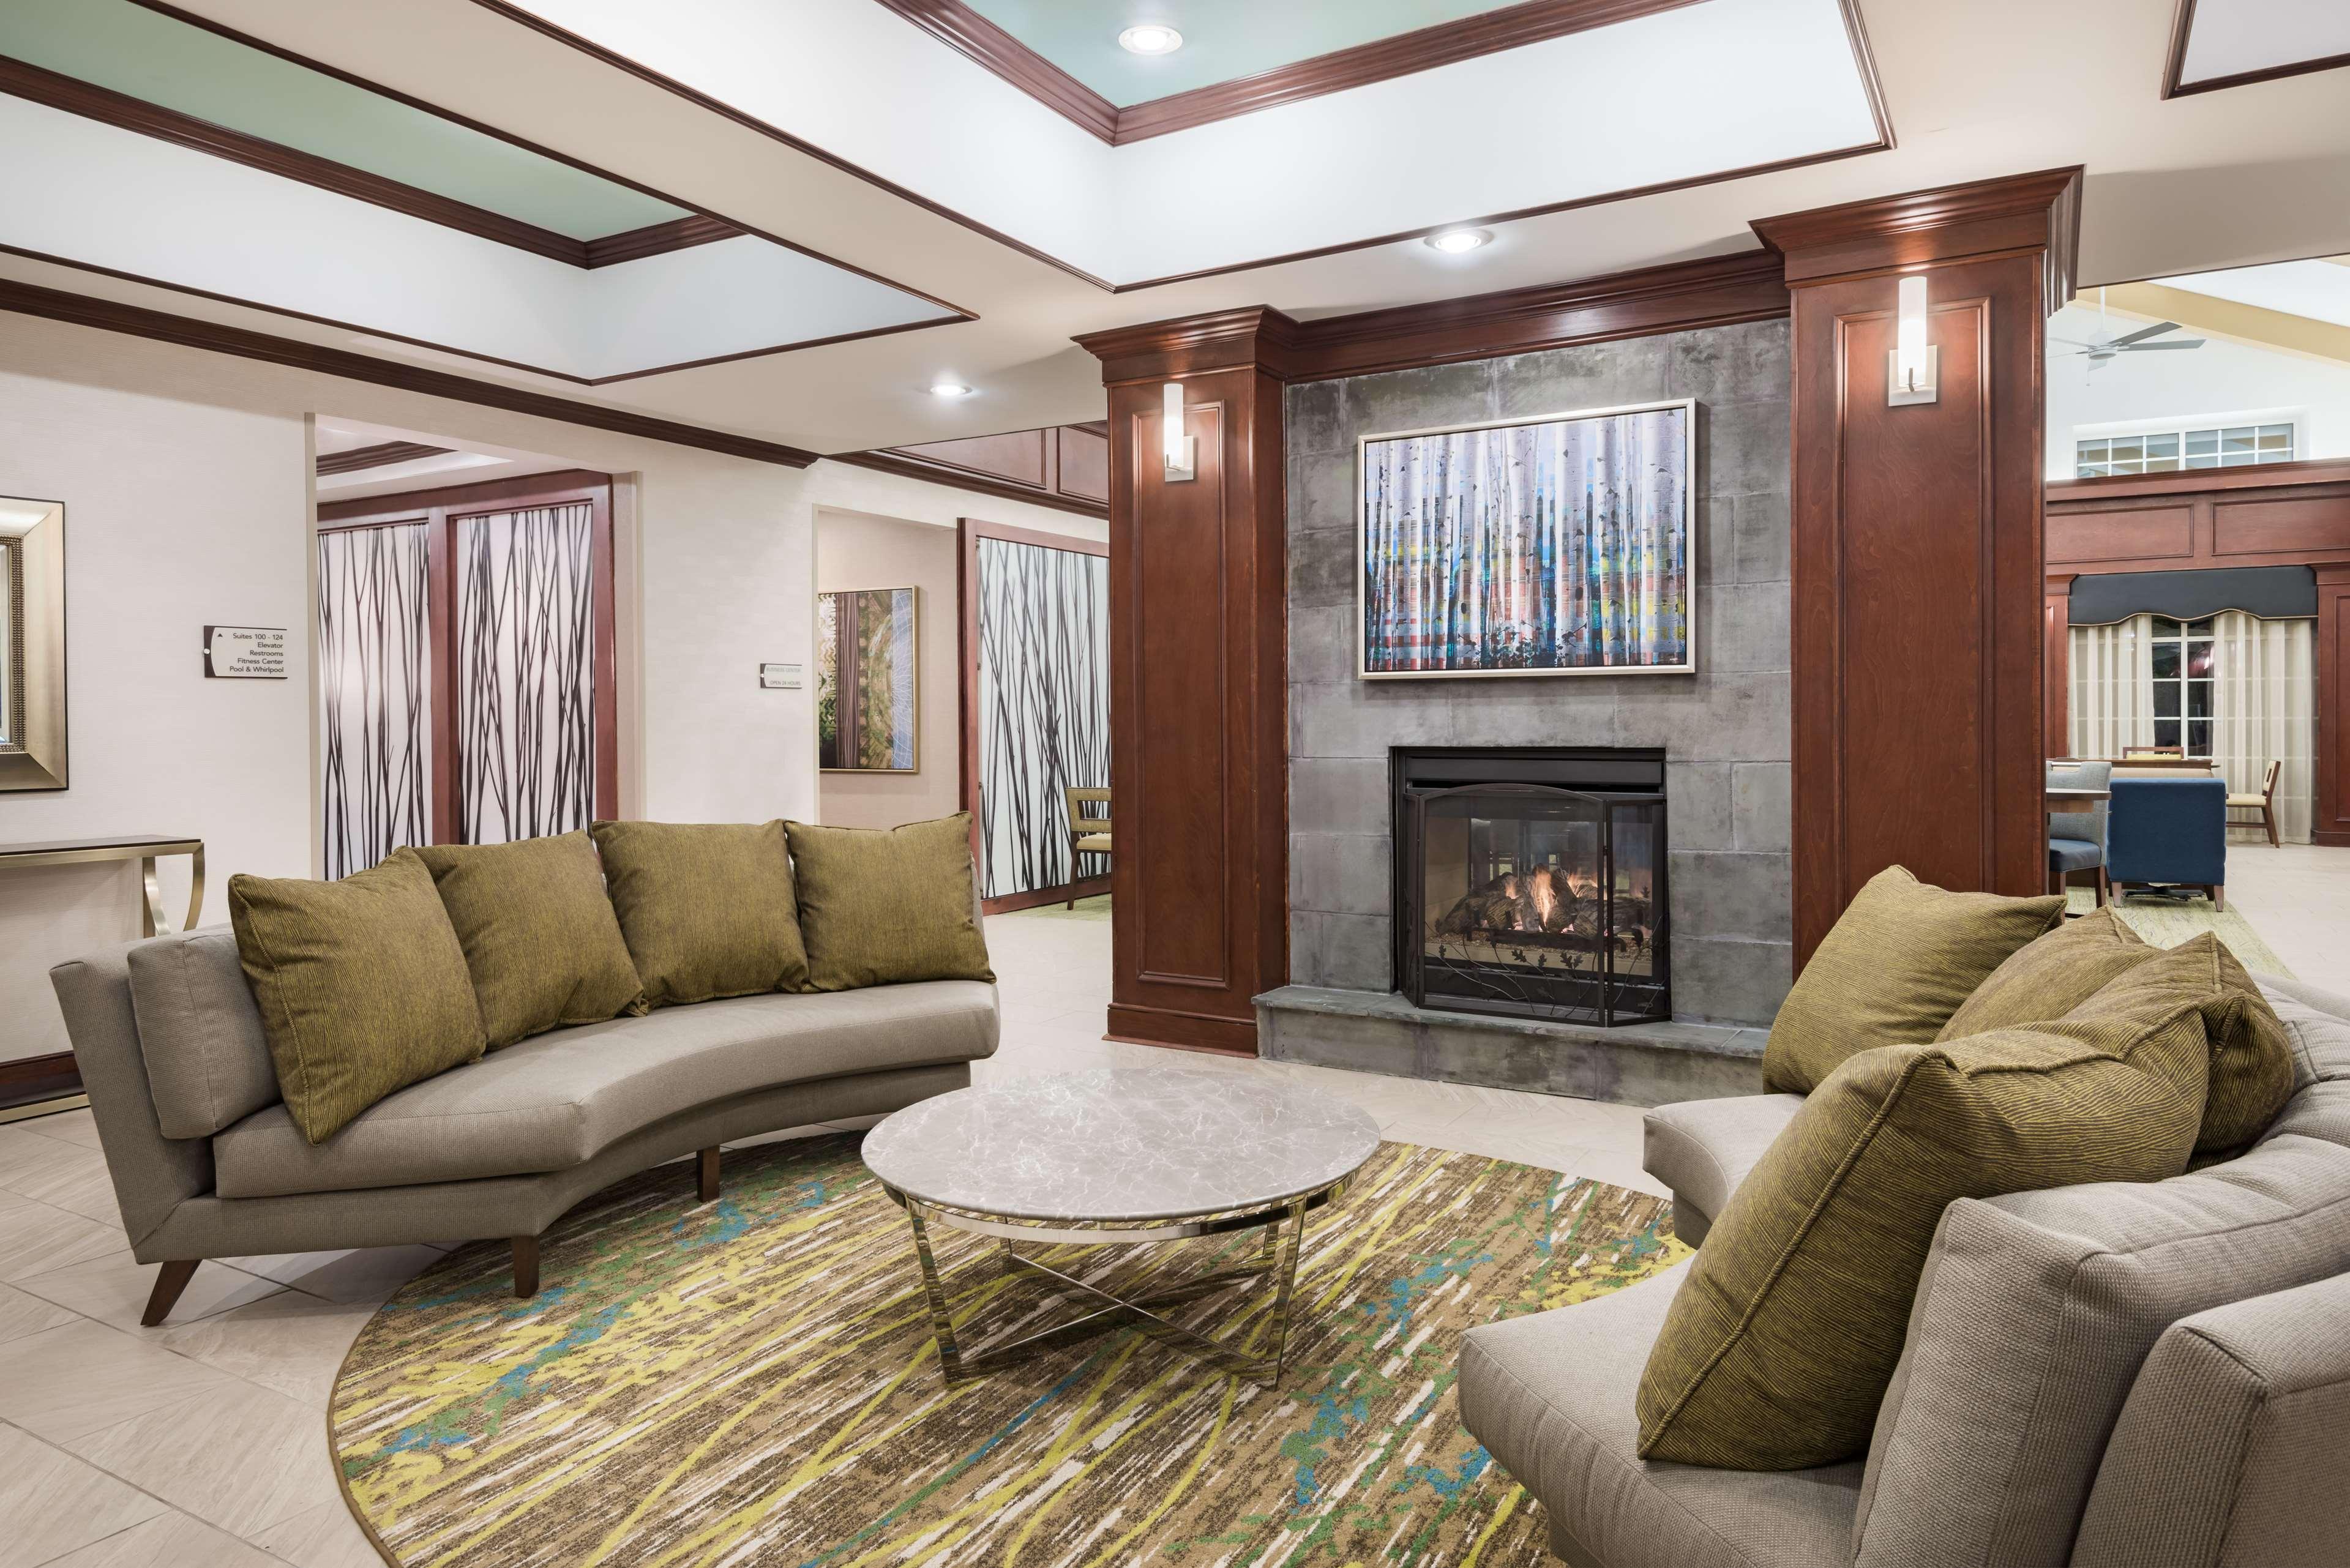 Homewood Suites by Hilton Holyoke-Springfield/North image 3